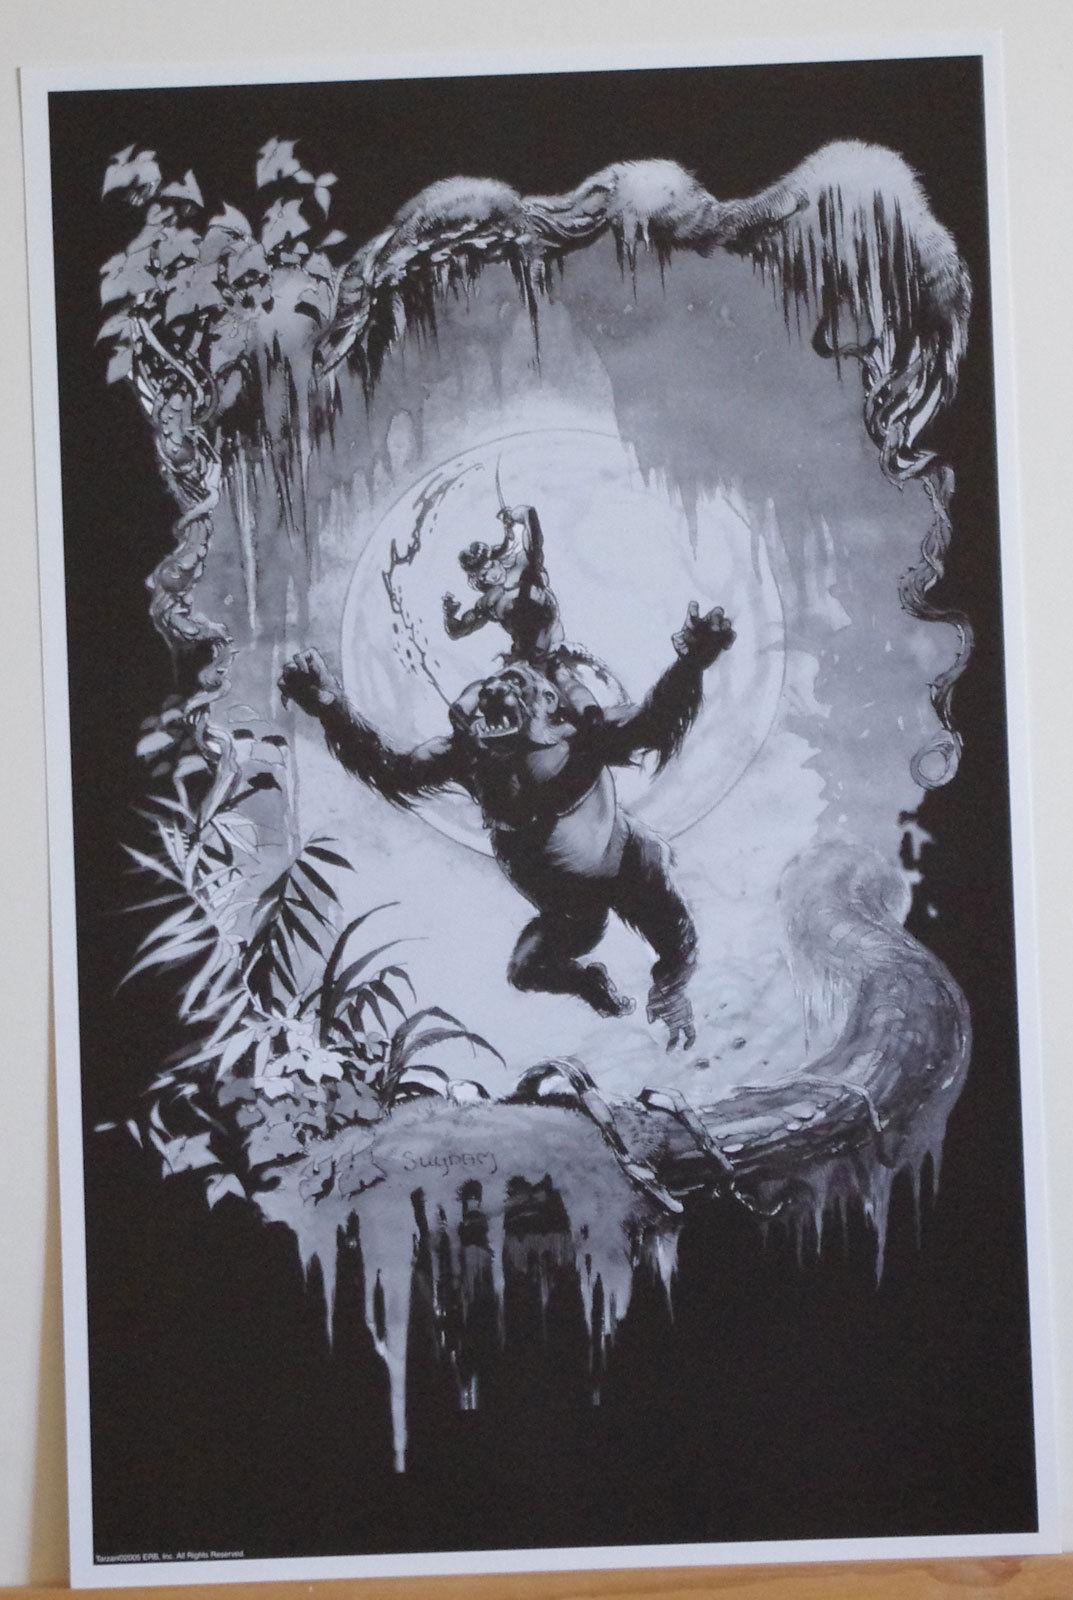 ARTHUR SUYDAM, TARZAN print, ERB, of the Apes, fighting gorilla, 11